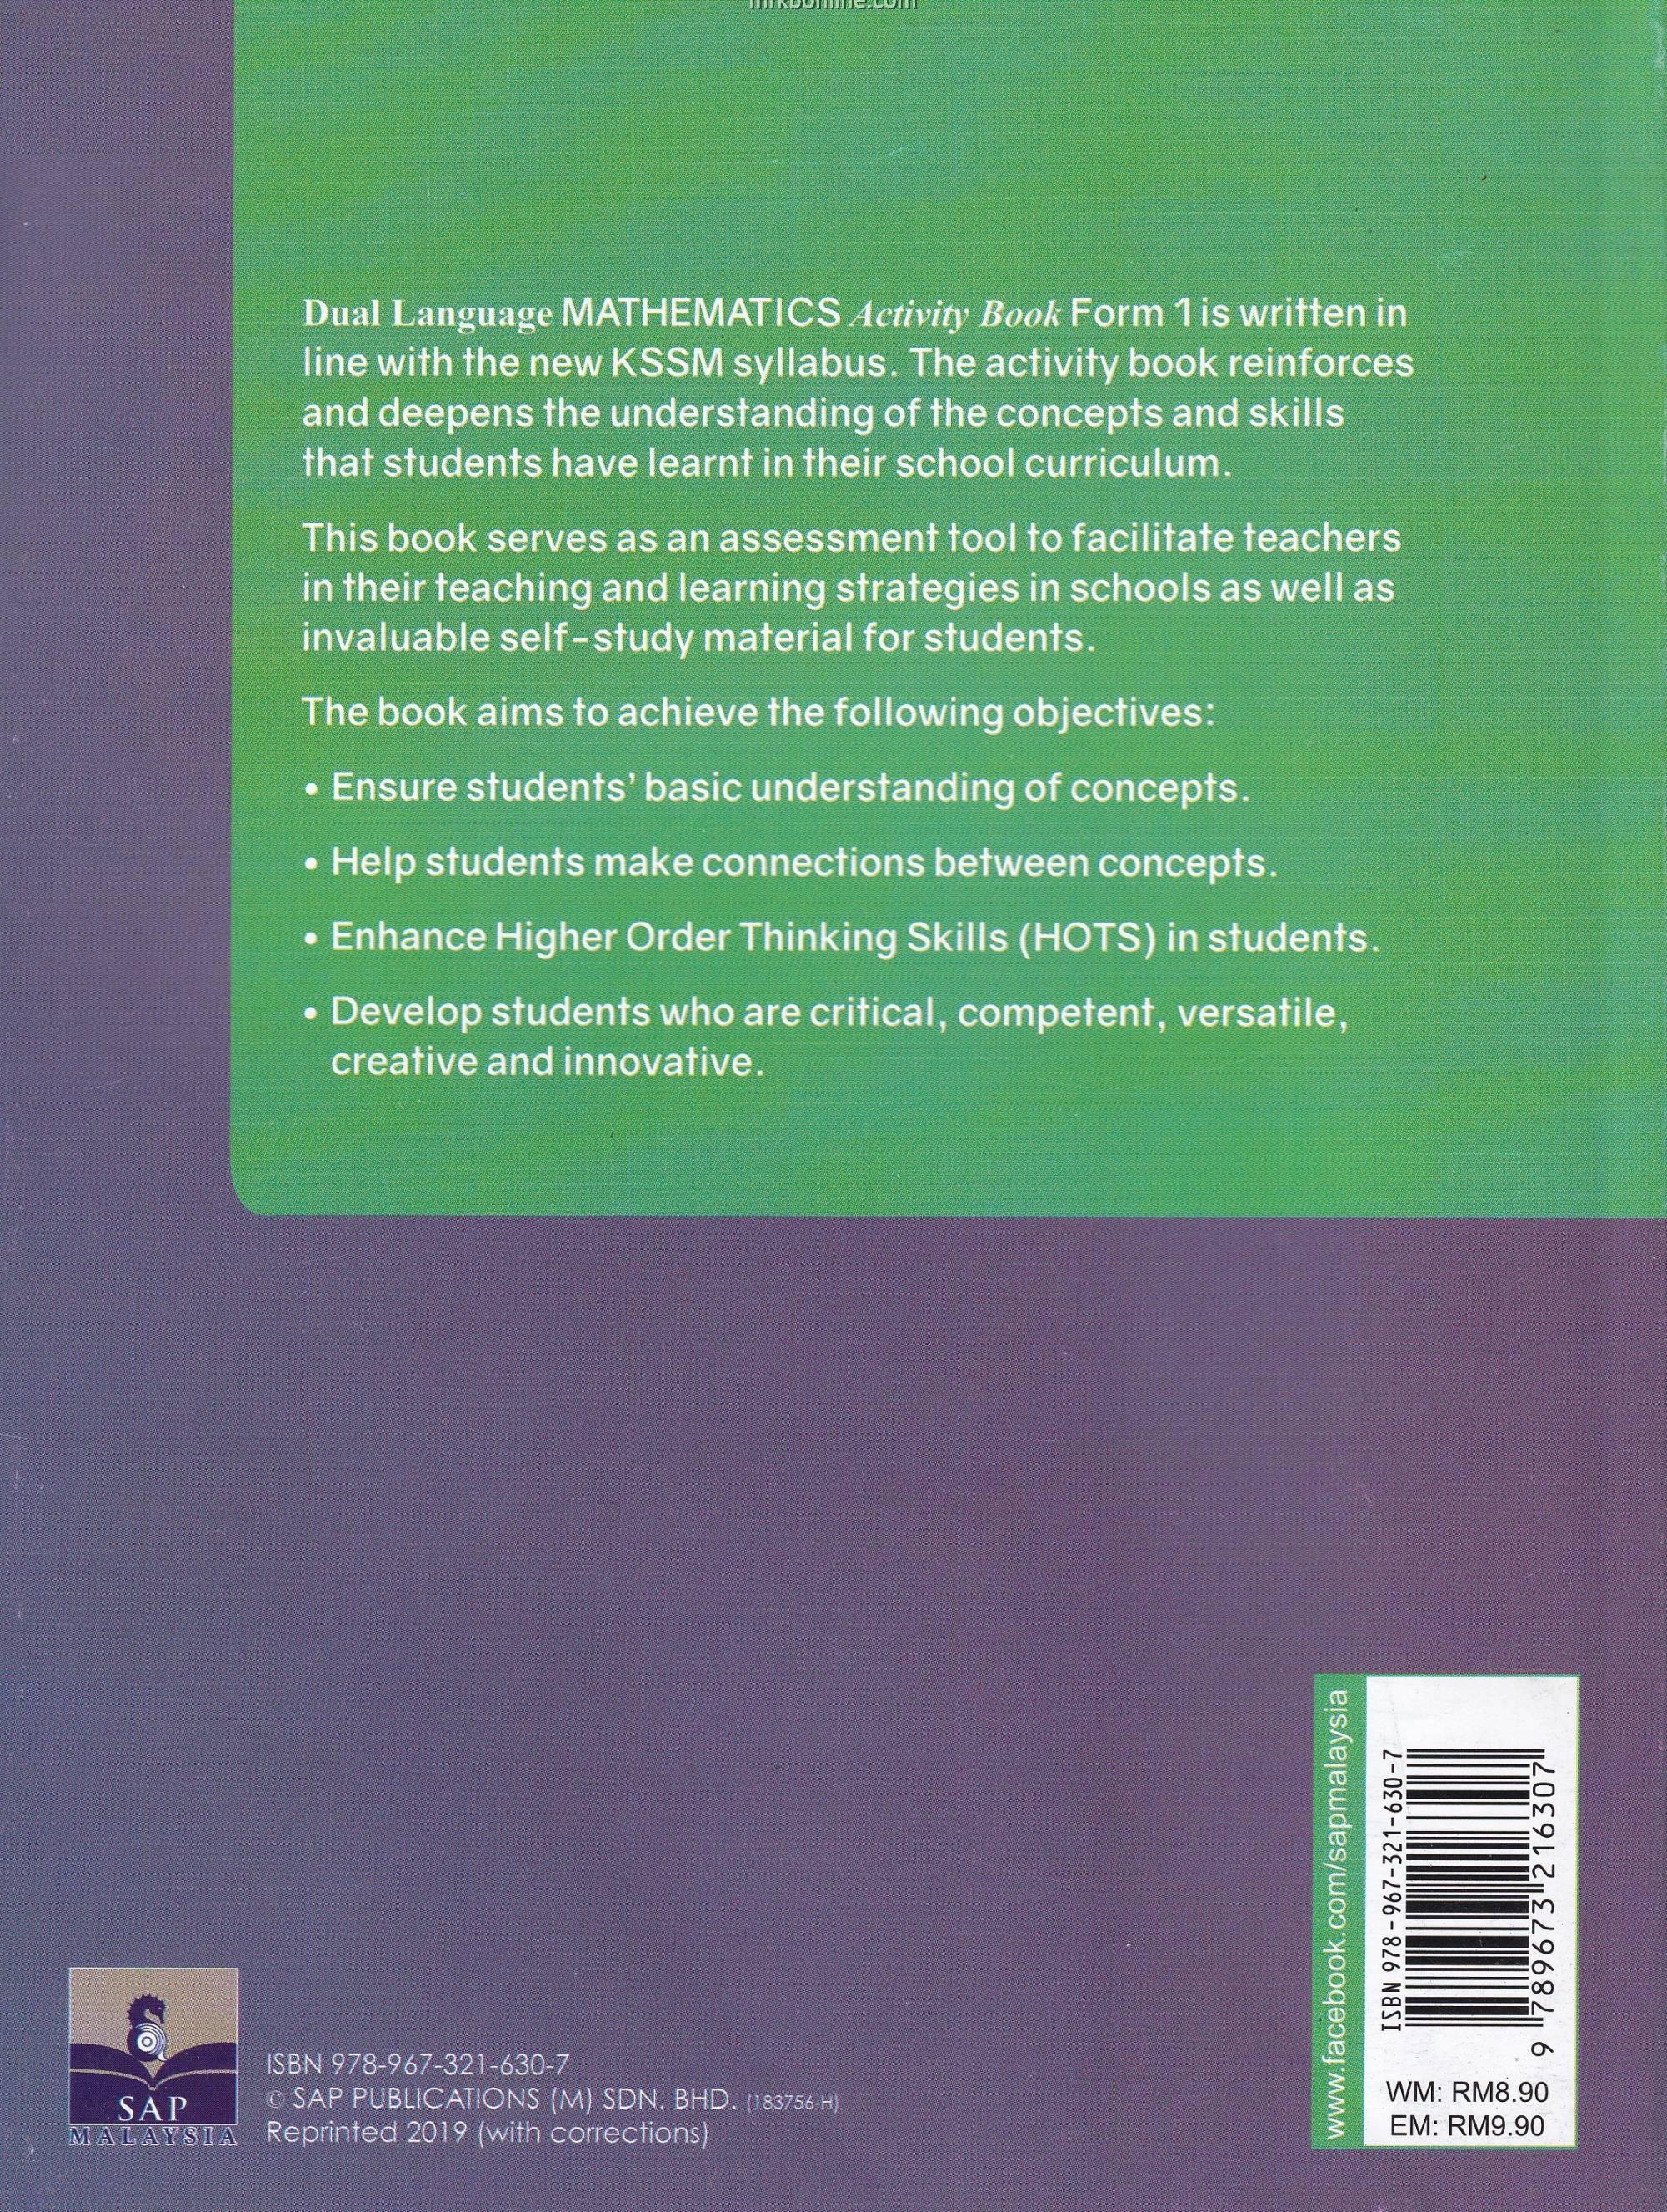 Dual Language Mathematics Activity Book Form 1